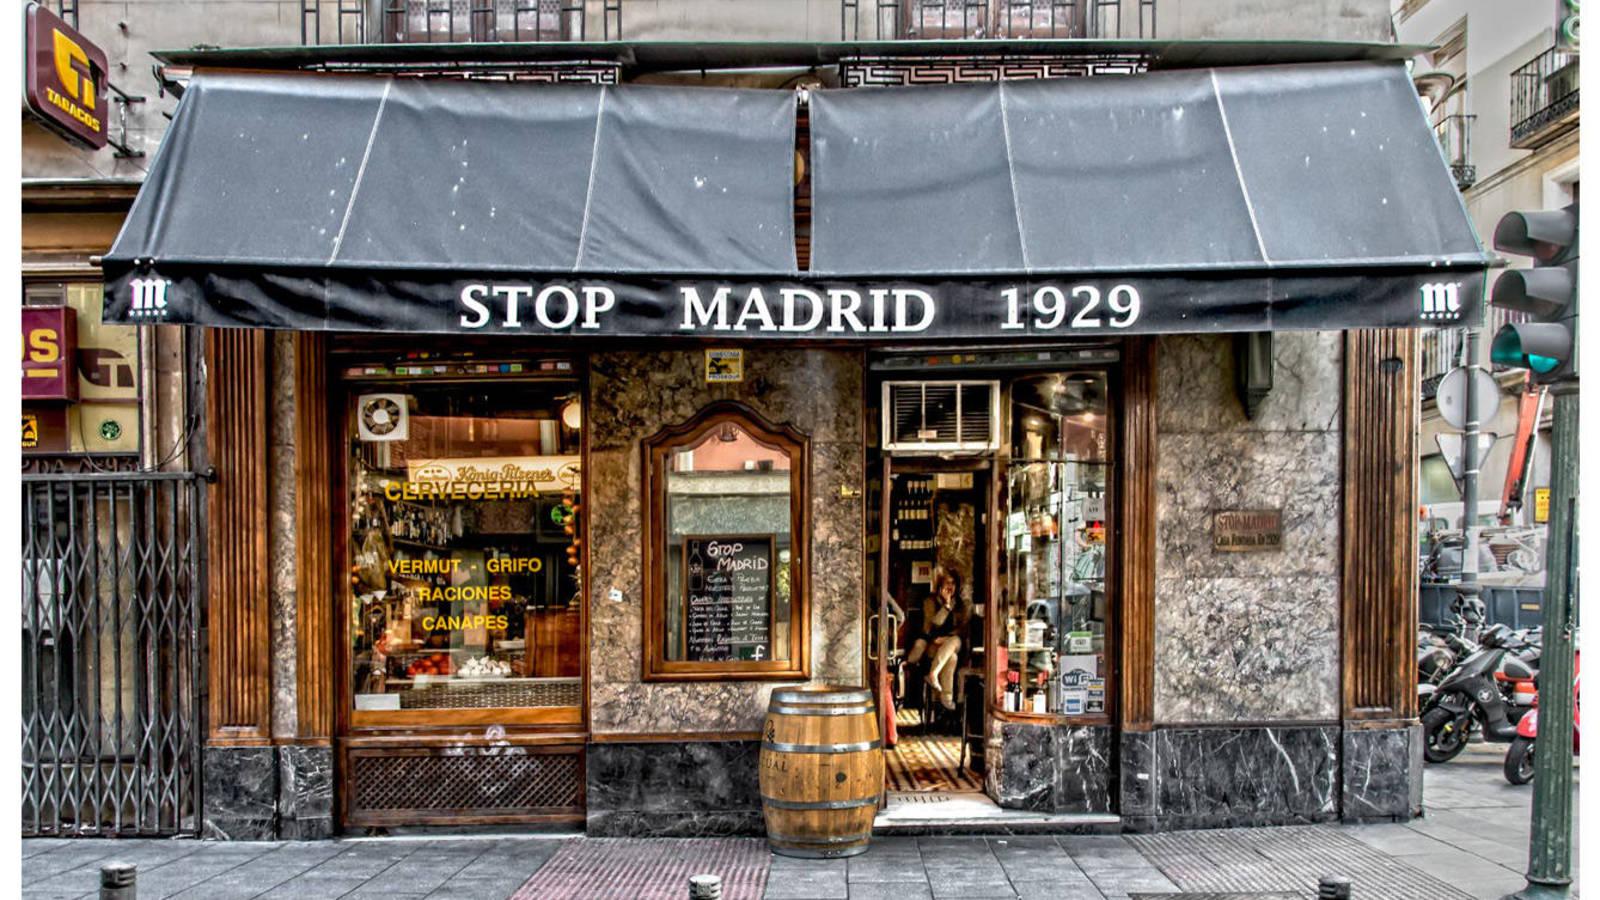 Taberna Stop Madrid - mejor vermut Madrid